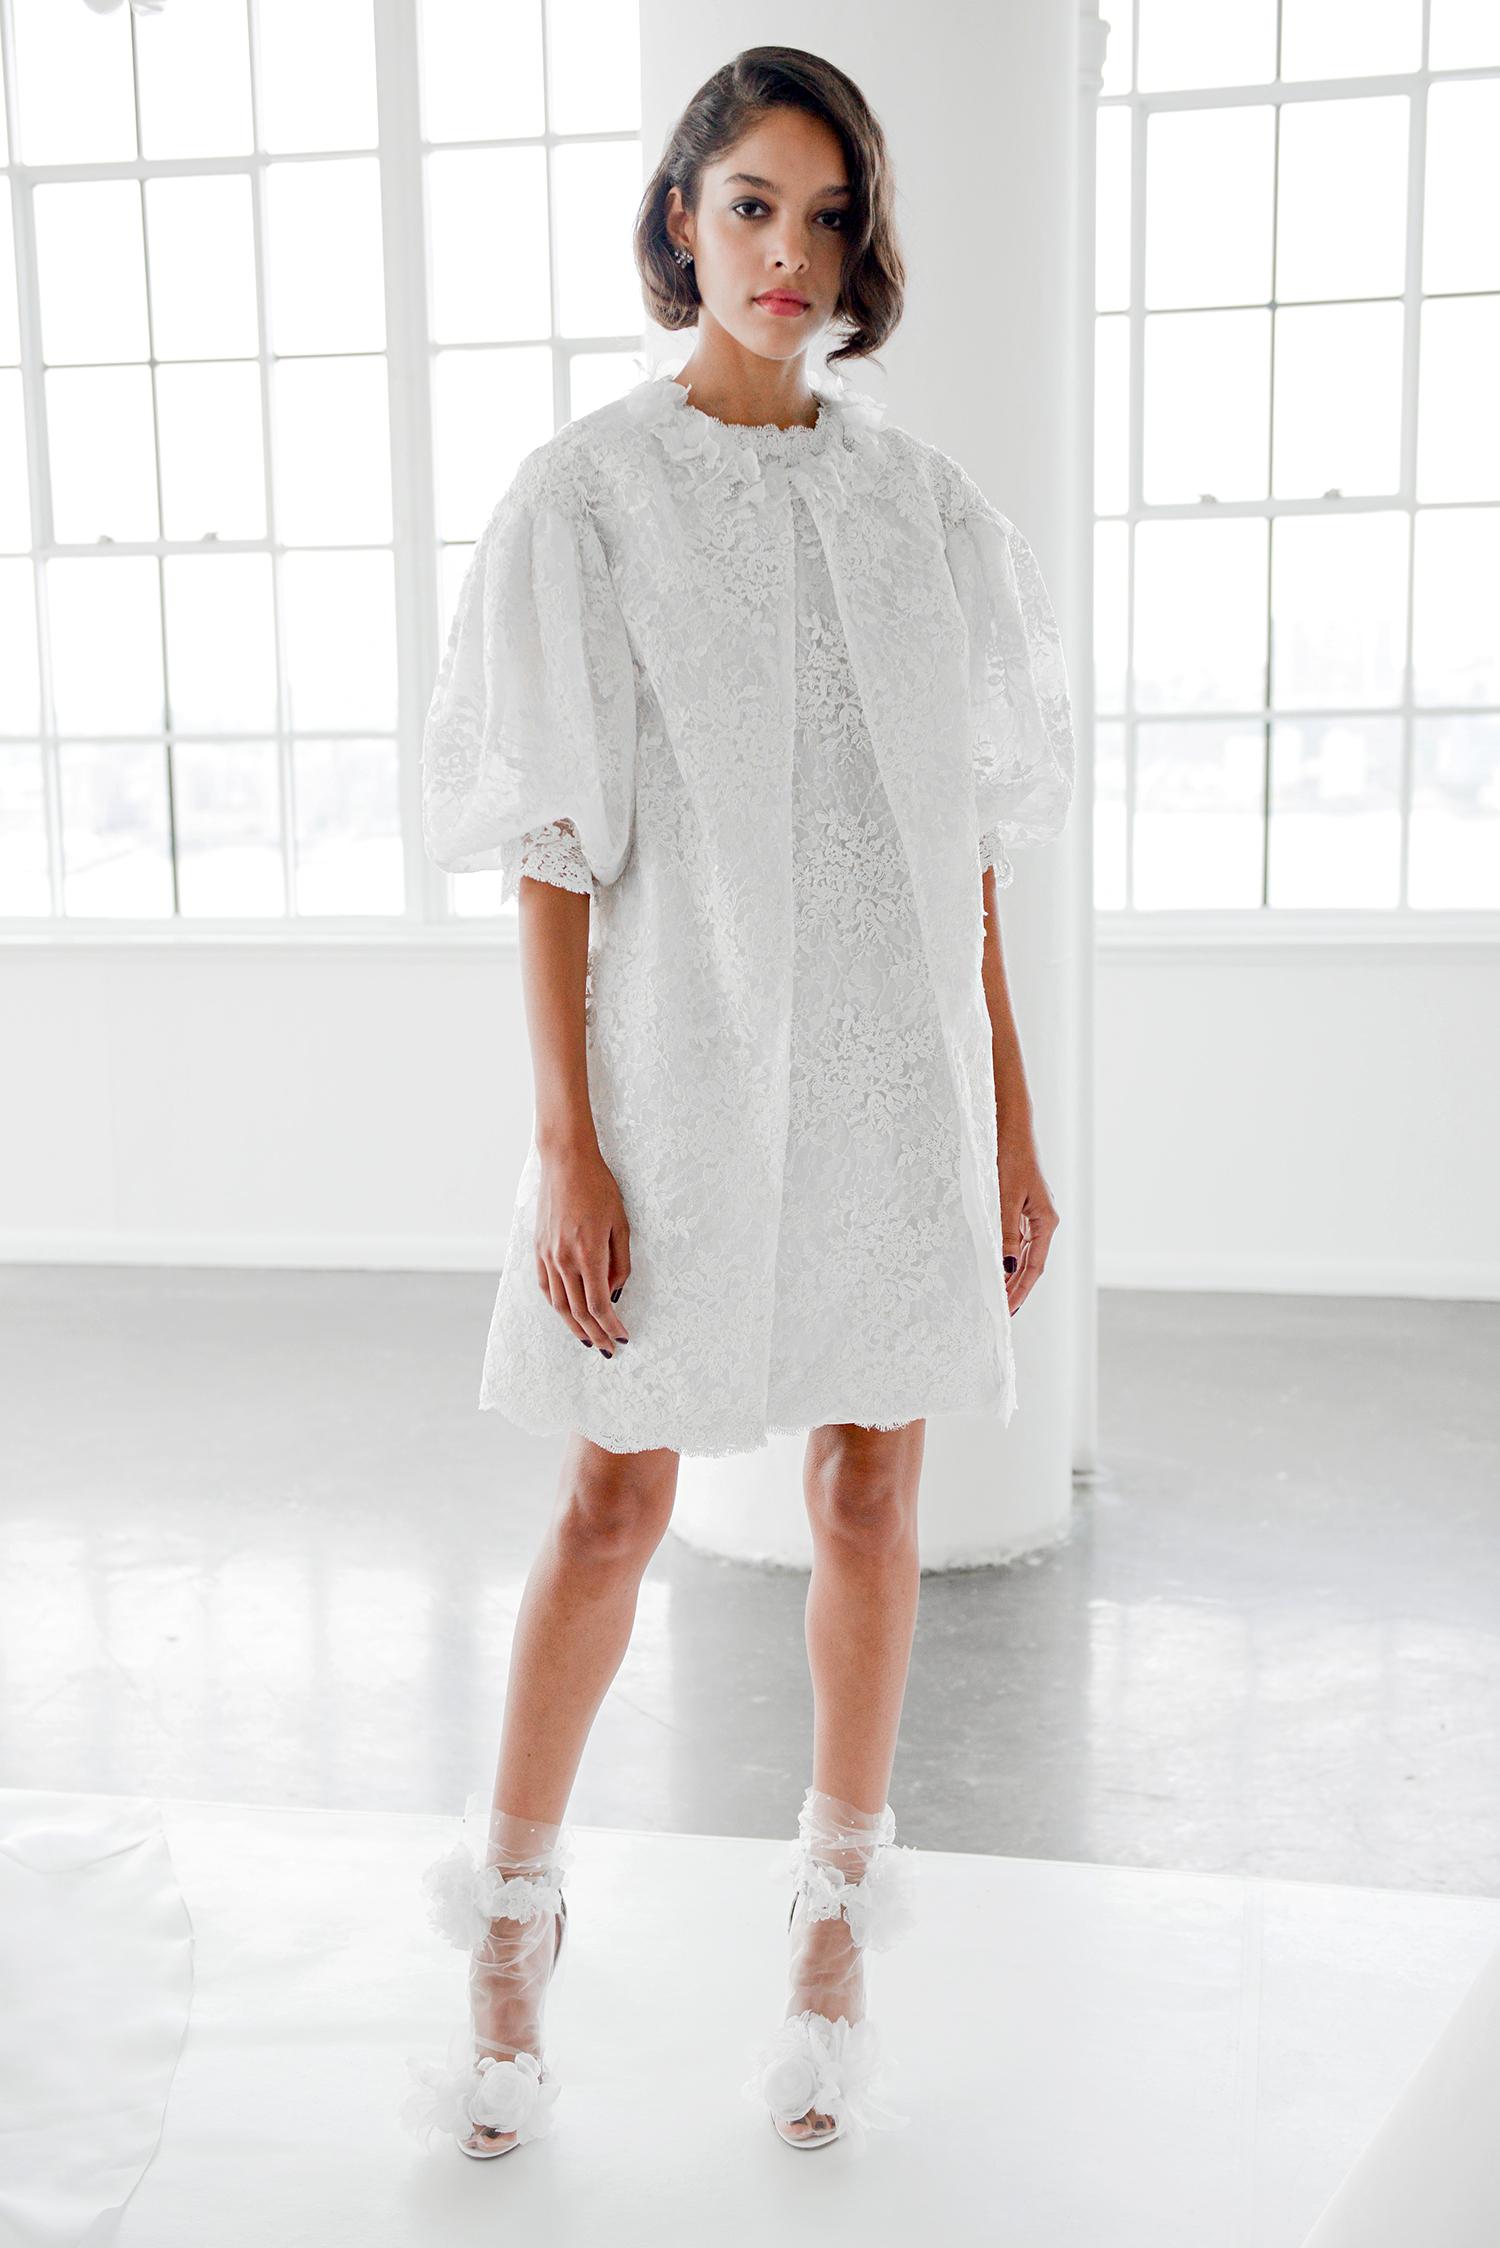 marchesa fall 2018 knee-length with flouncy sleeves